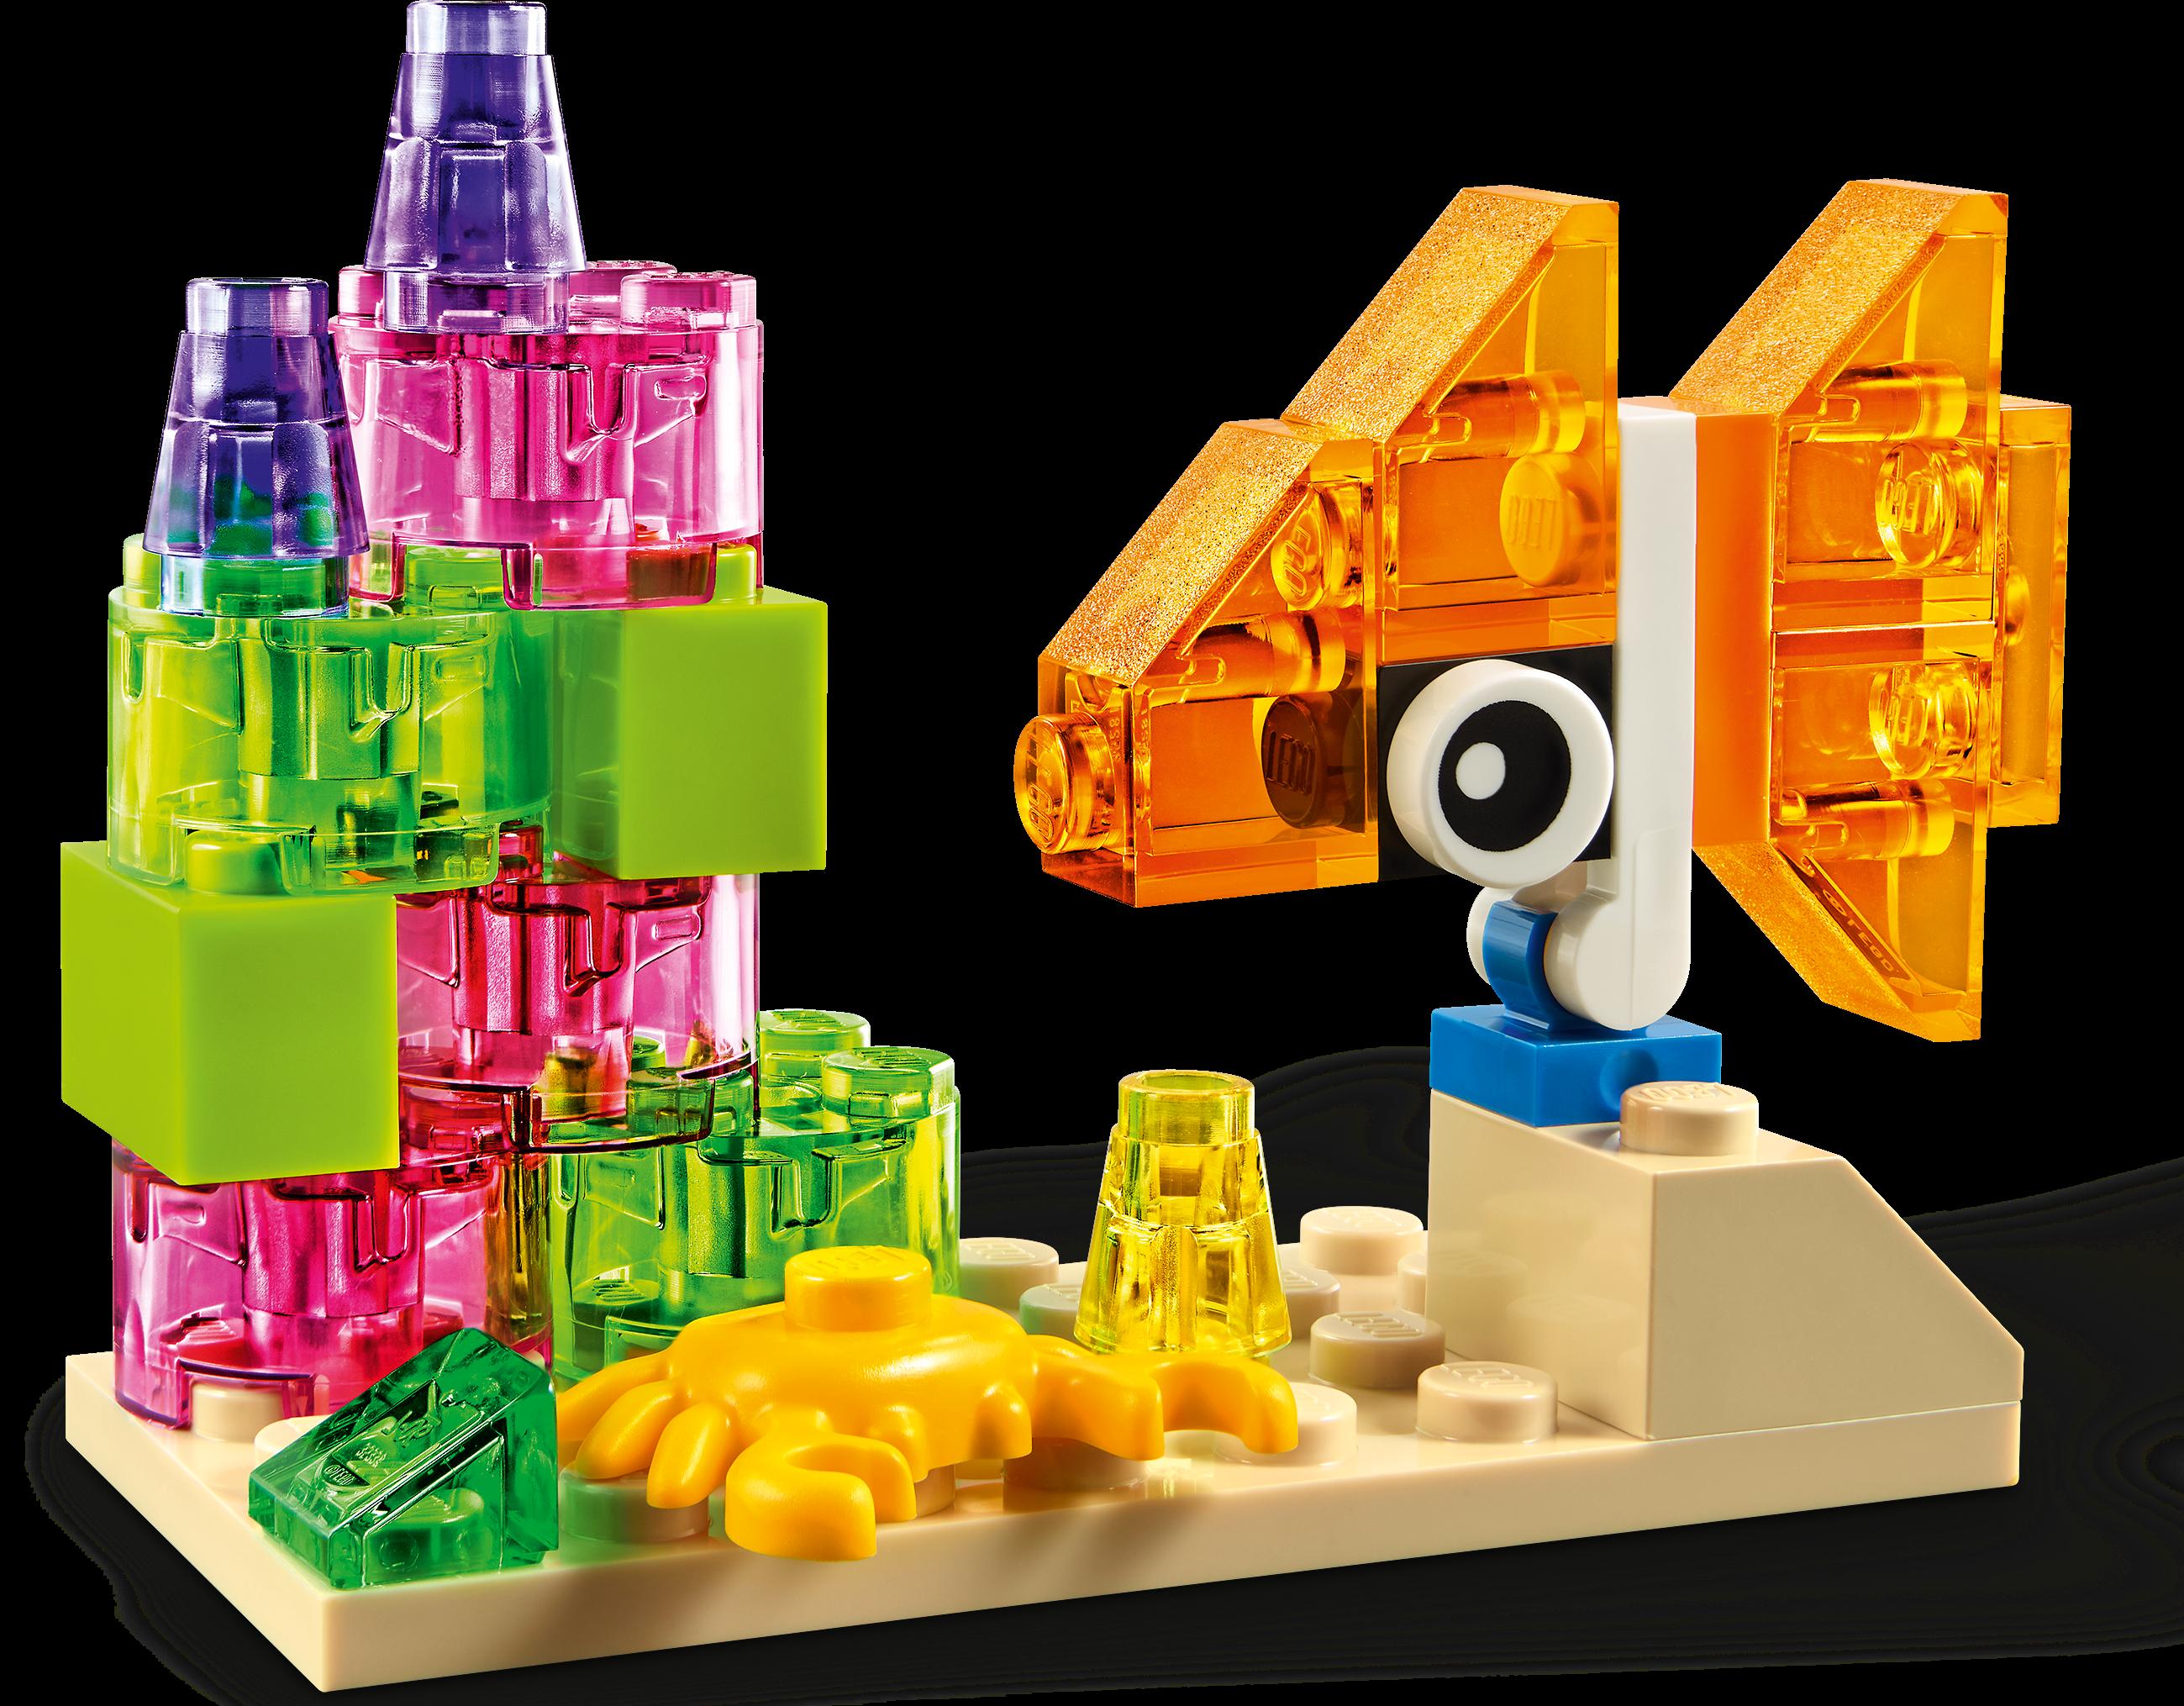 Creative Transparent Bricks